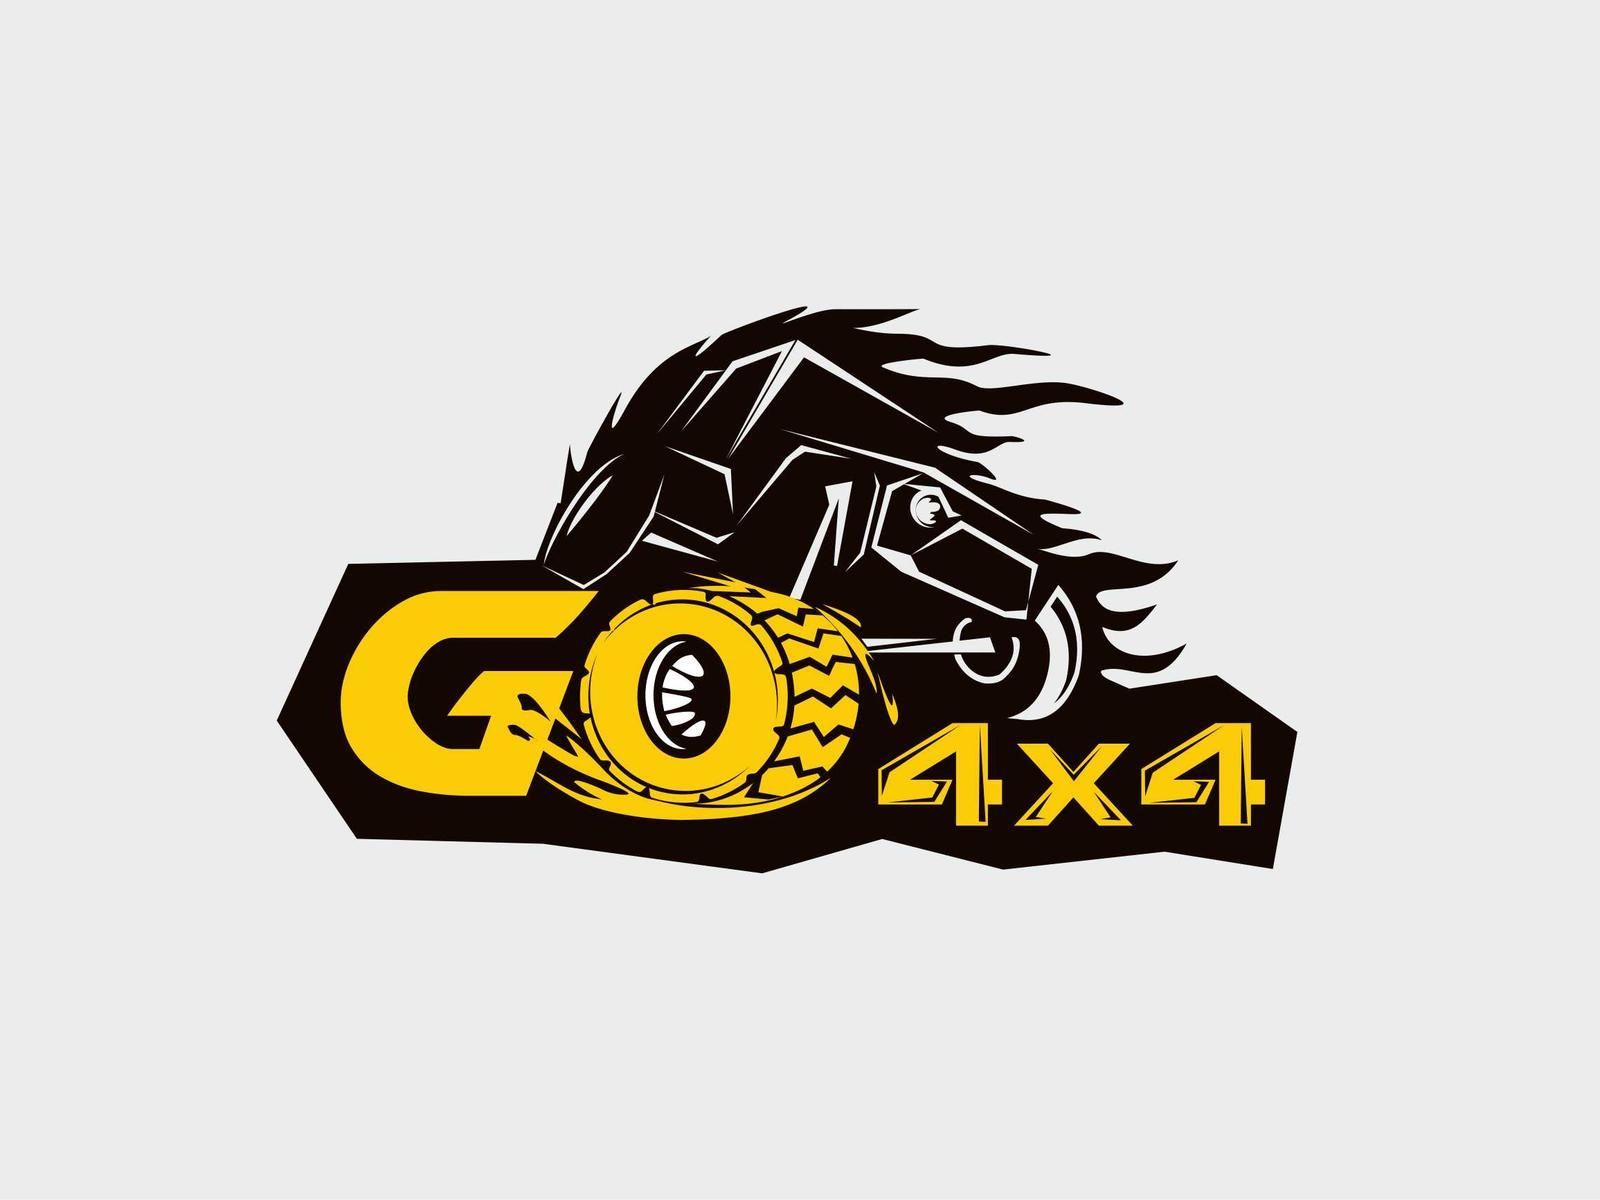 improve a logo for go4x4 offroad community by zvercat good rh pinterest com off road logo png off road logo maker